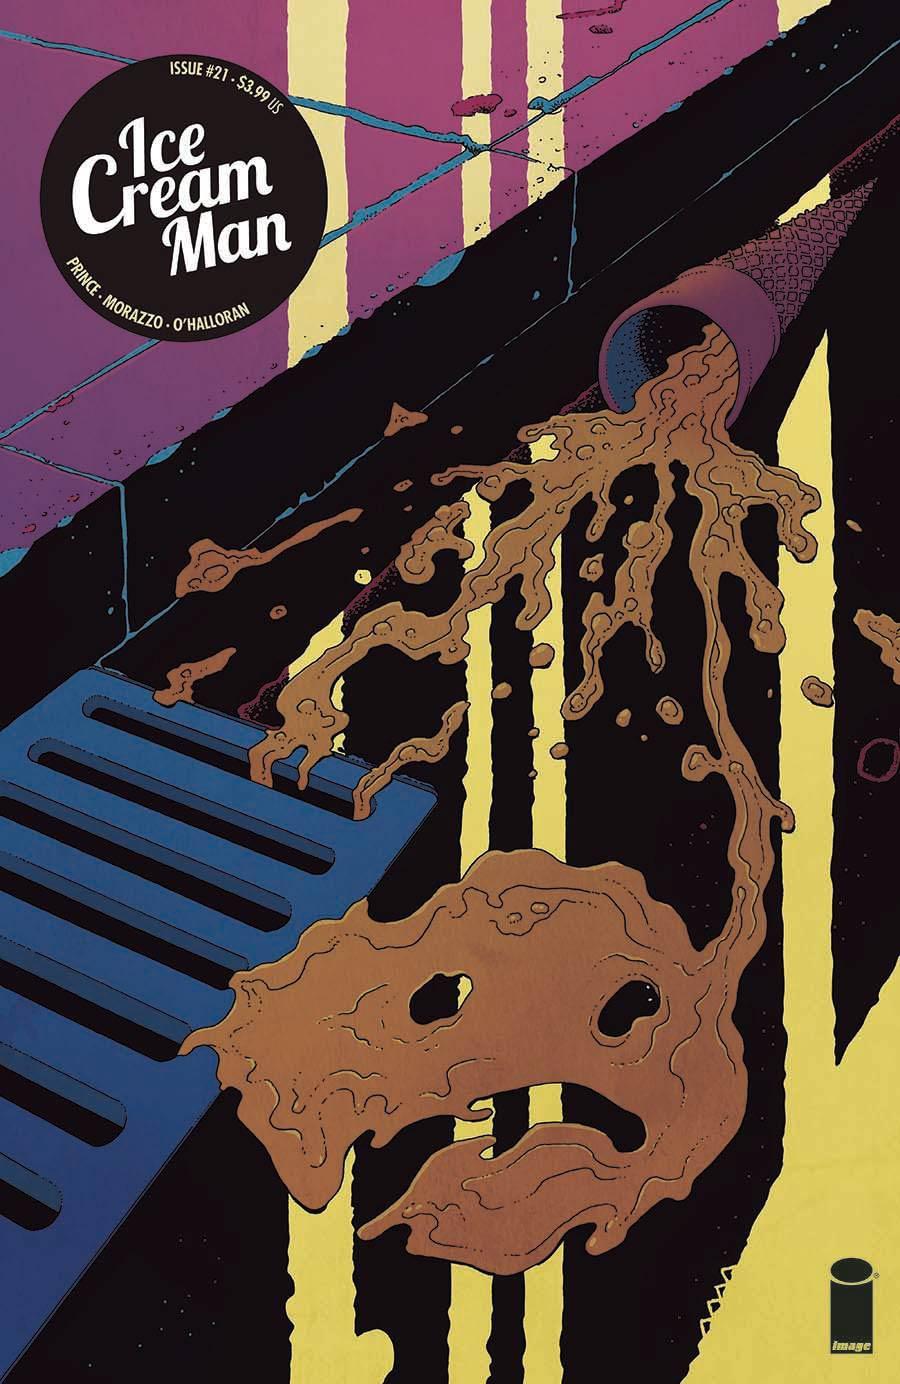 Ice Cream Man #21 Cover A Regular Martin Morazzo & Chris OHalloran Cover